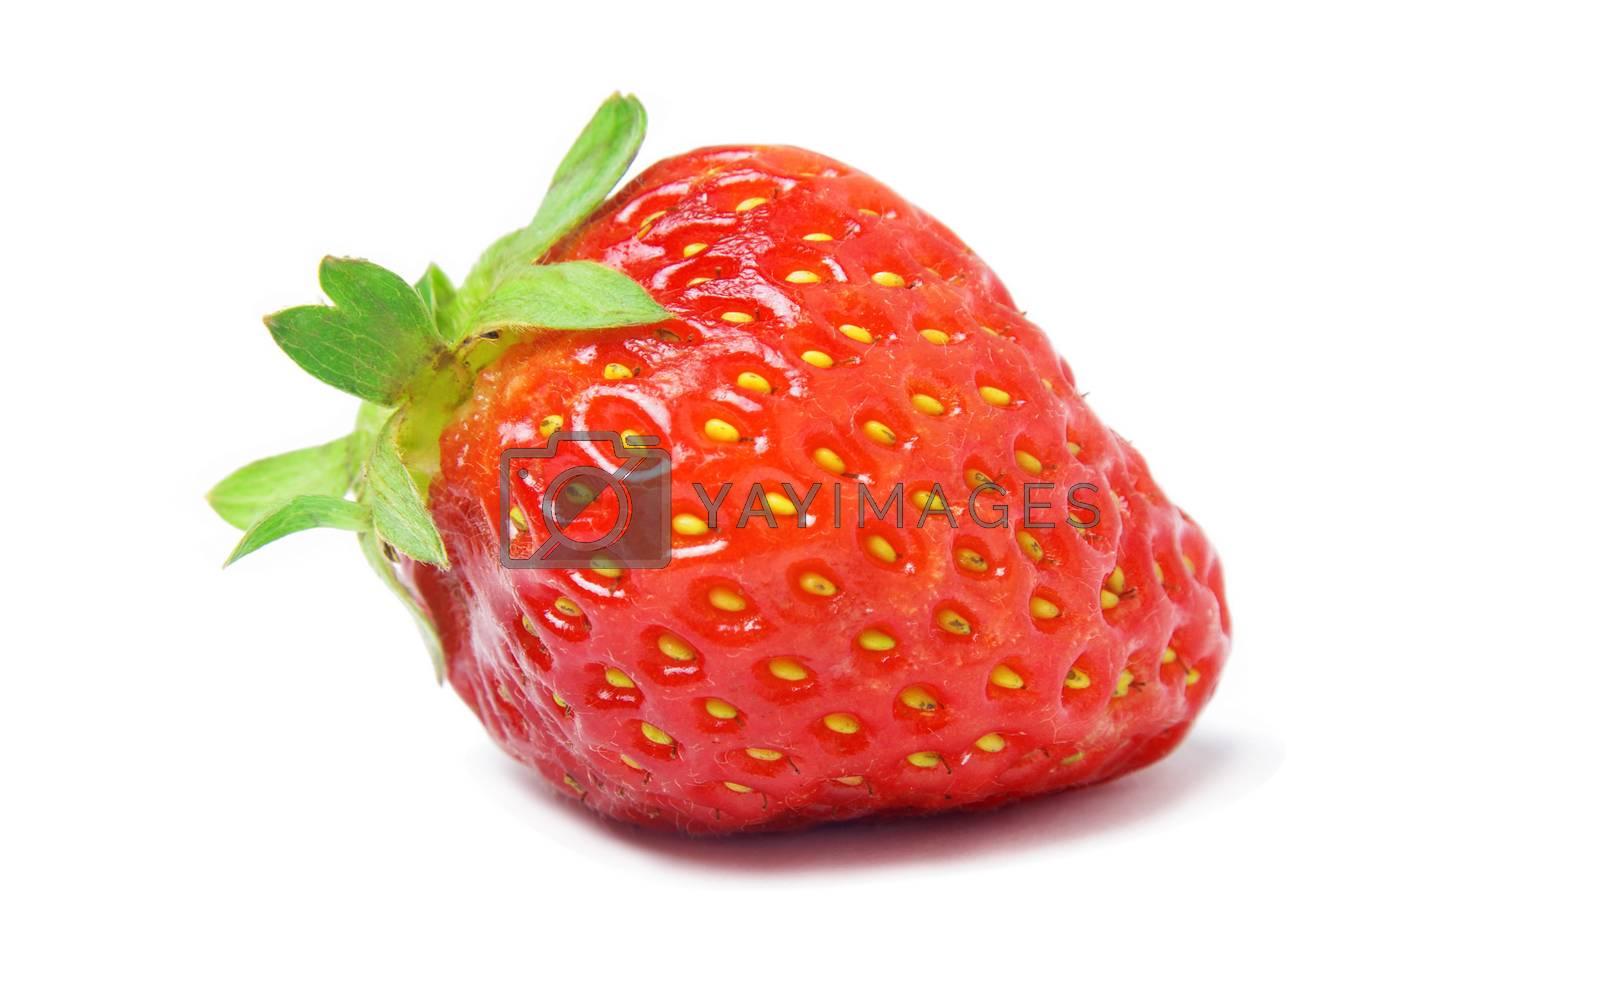 strawberry closeup on white background